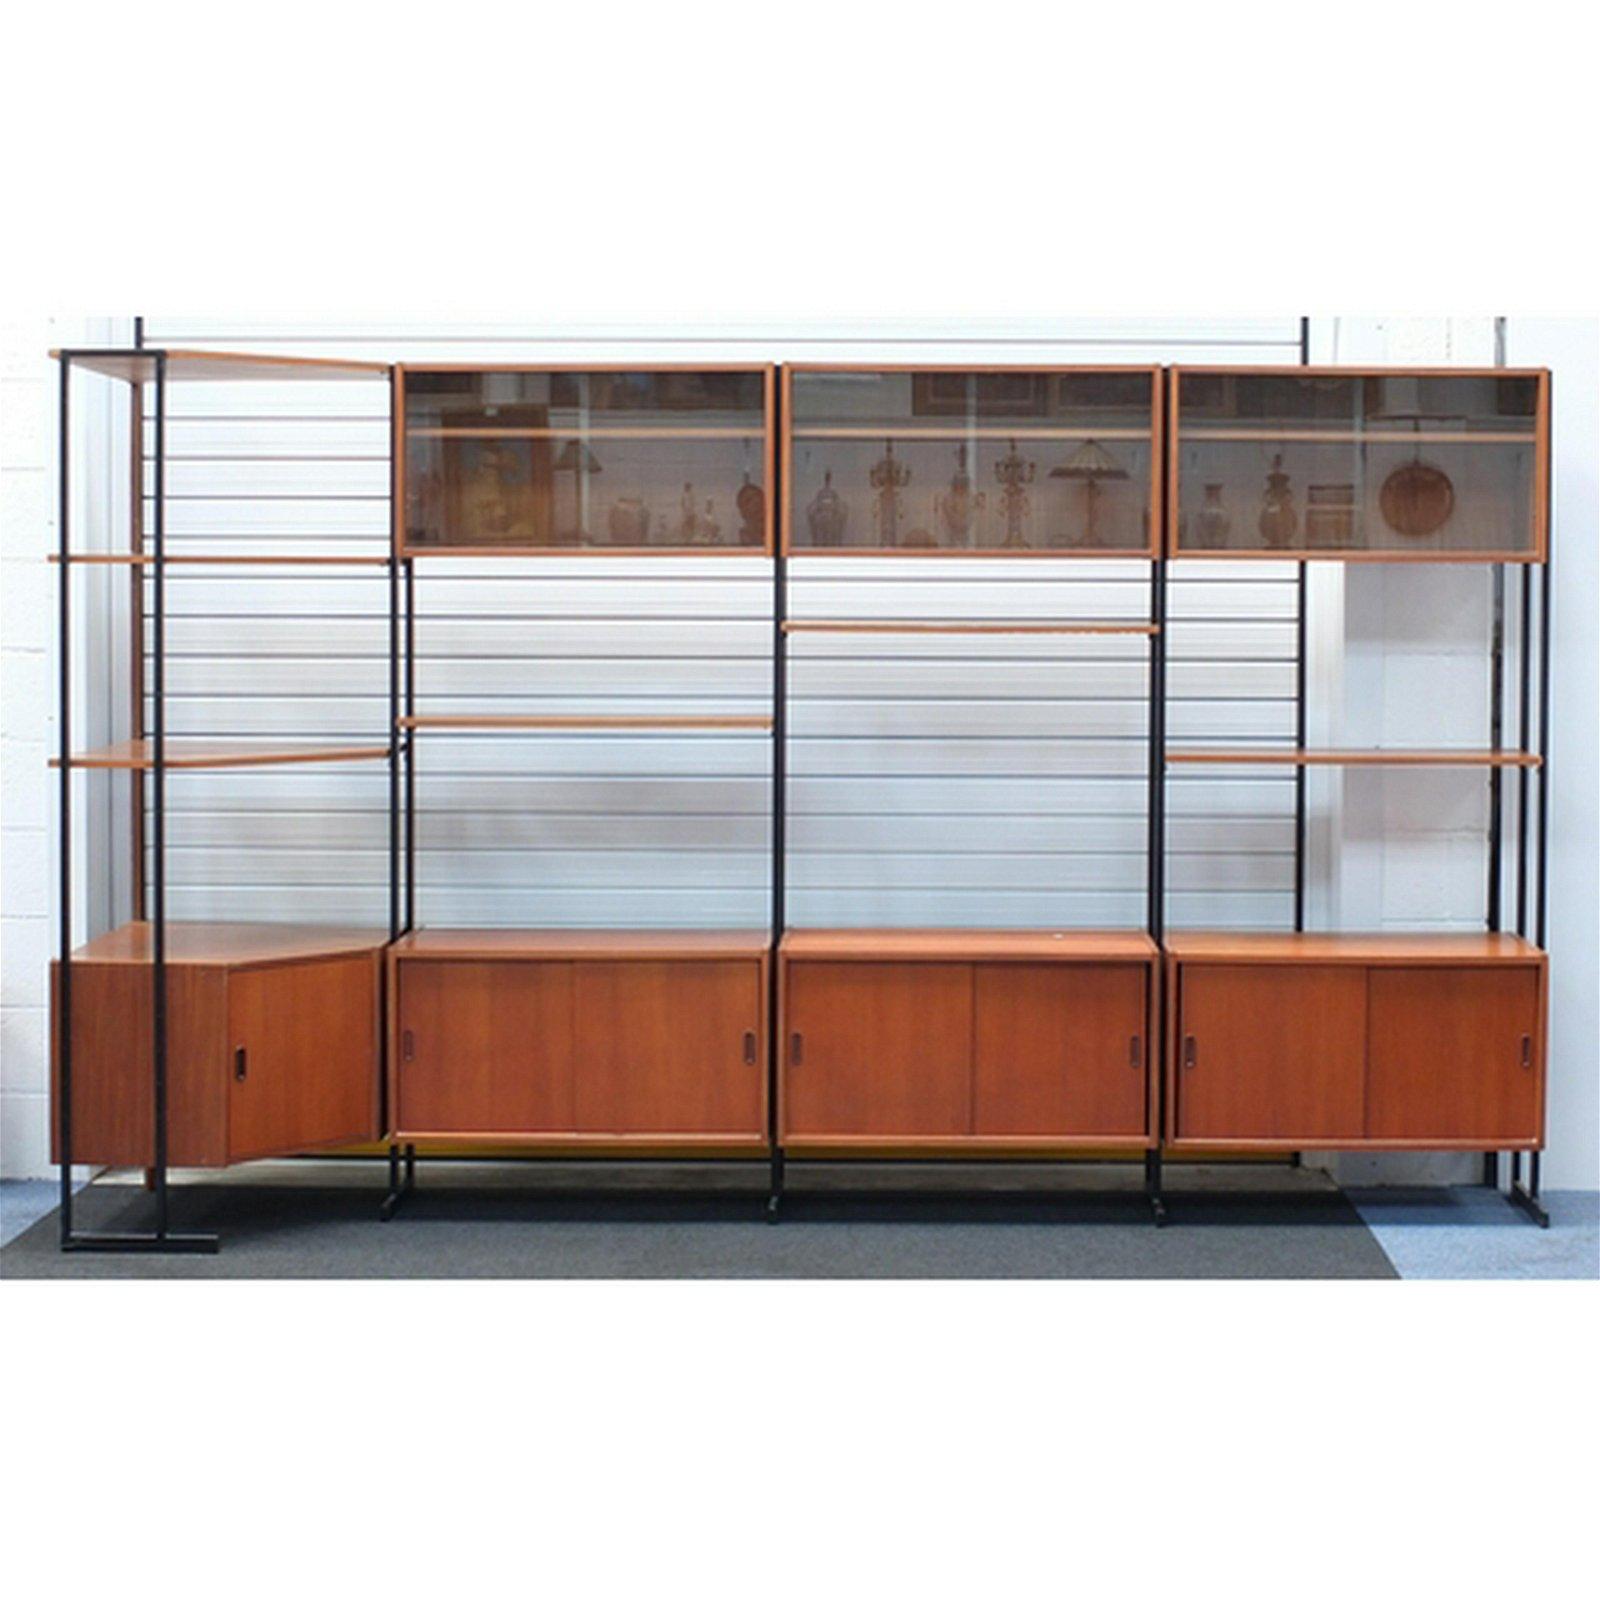 1960's teak Interflex modular corner bookcase, with